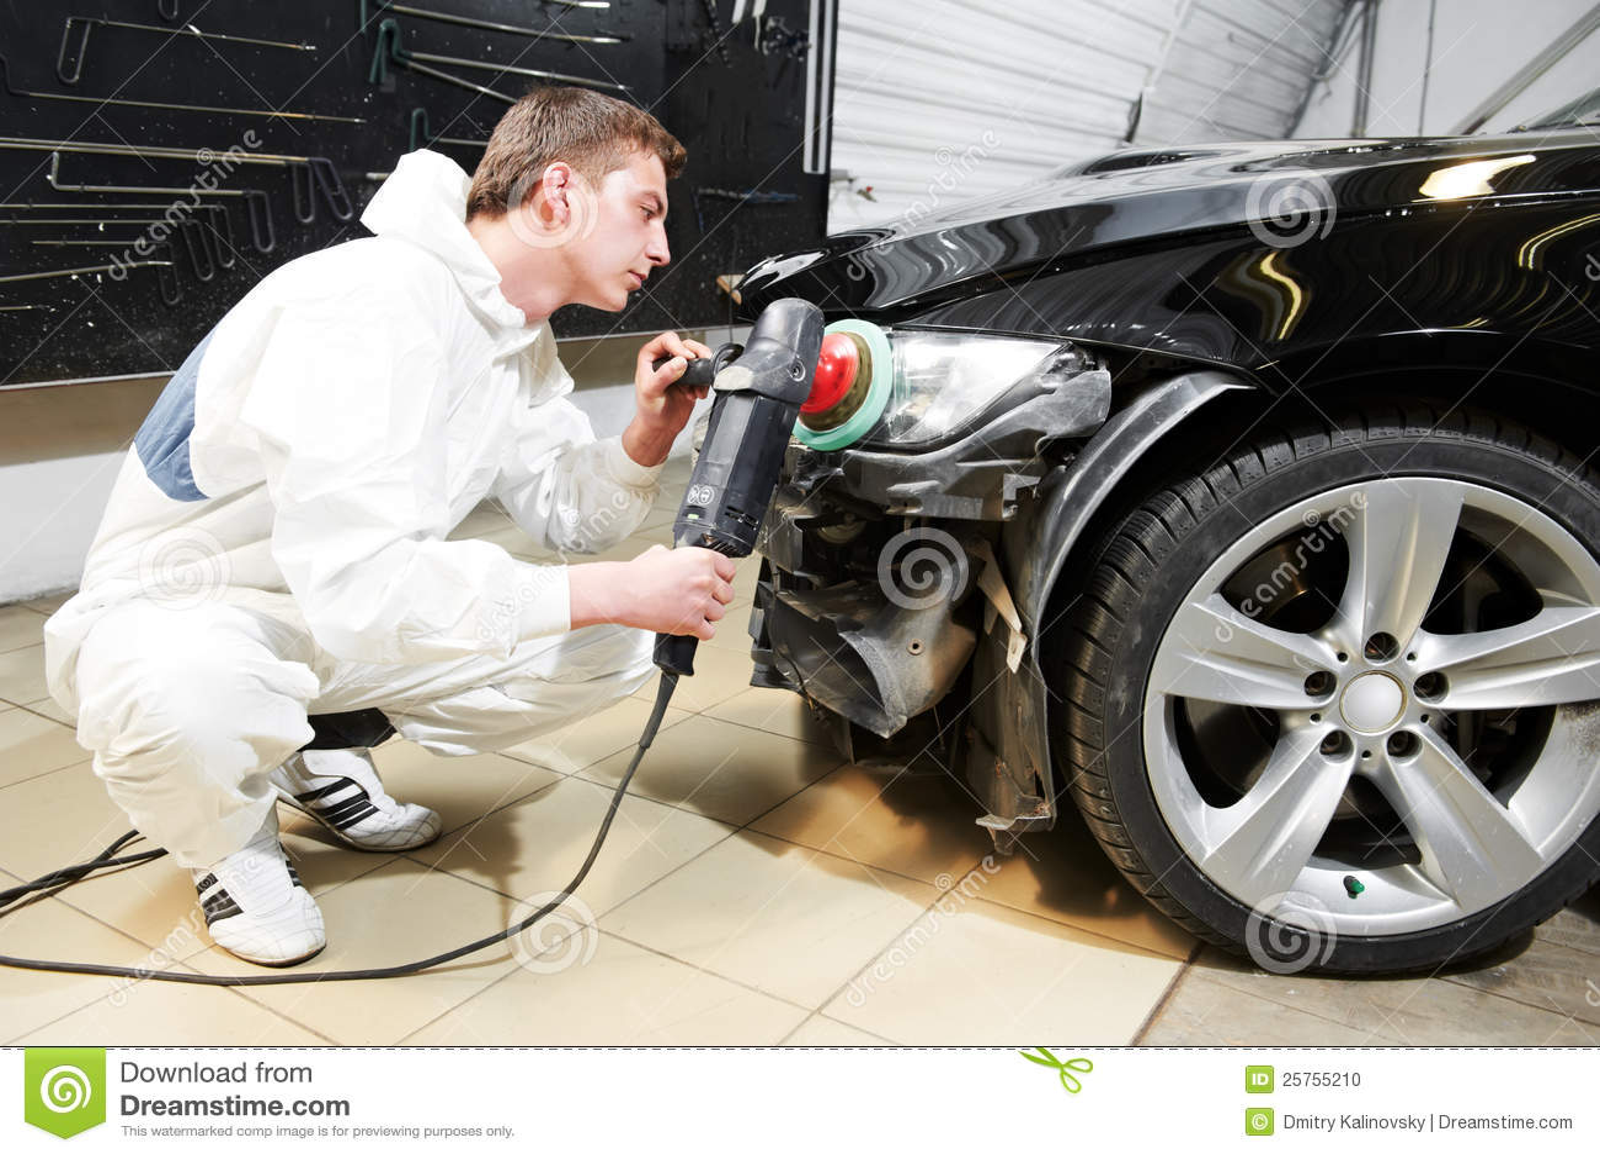 Buffing Car Scratches >> Mechanic Repairing And Polishing Car Headlight Stock Photo - Image: 25755210